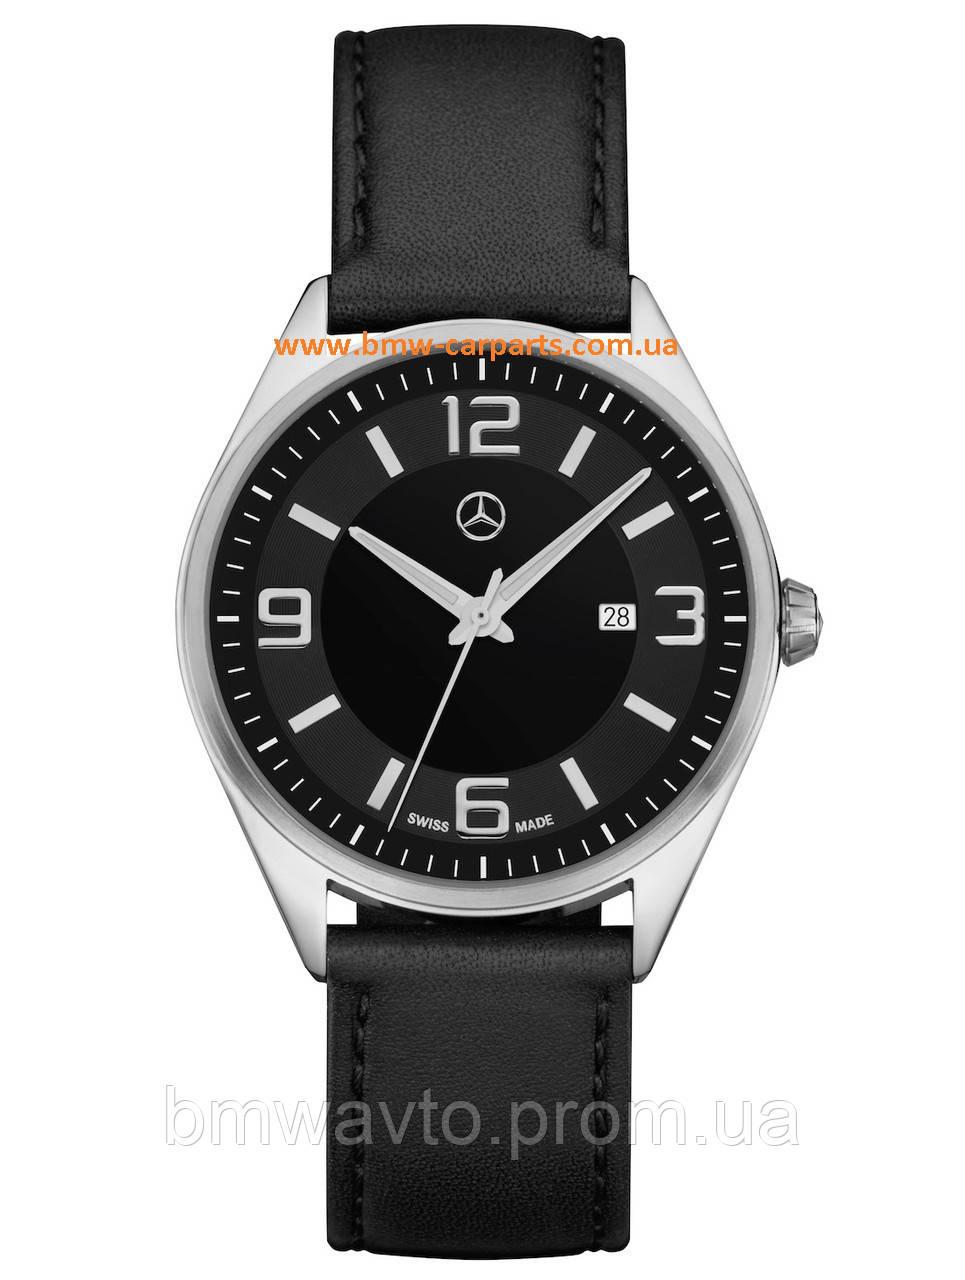 Мужские наручные часы Mercedes-Benz Men's Watch, Elegant Basic